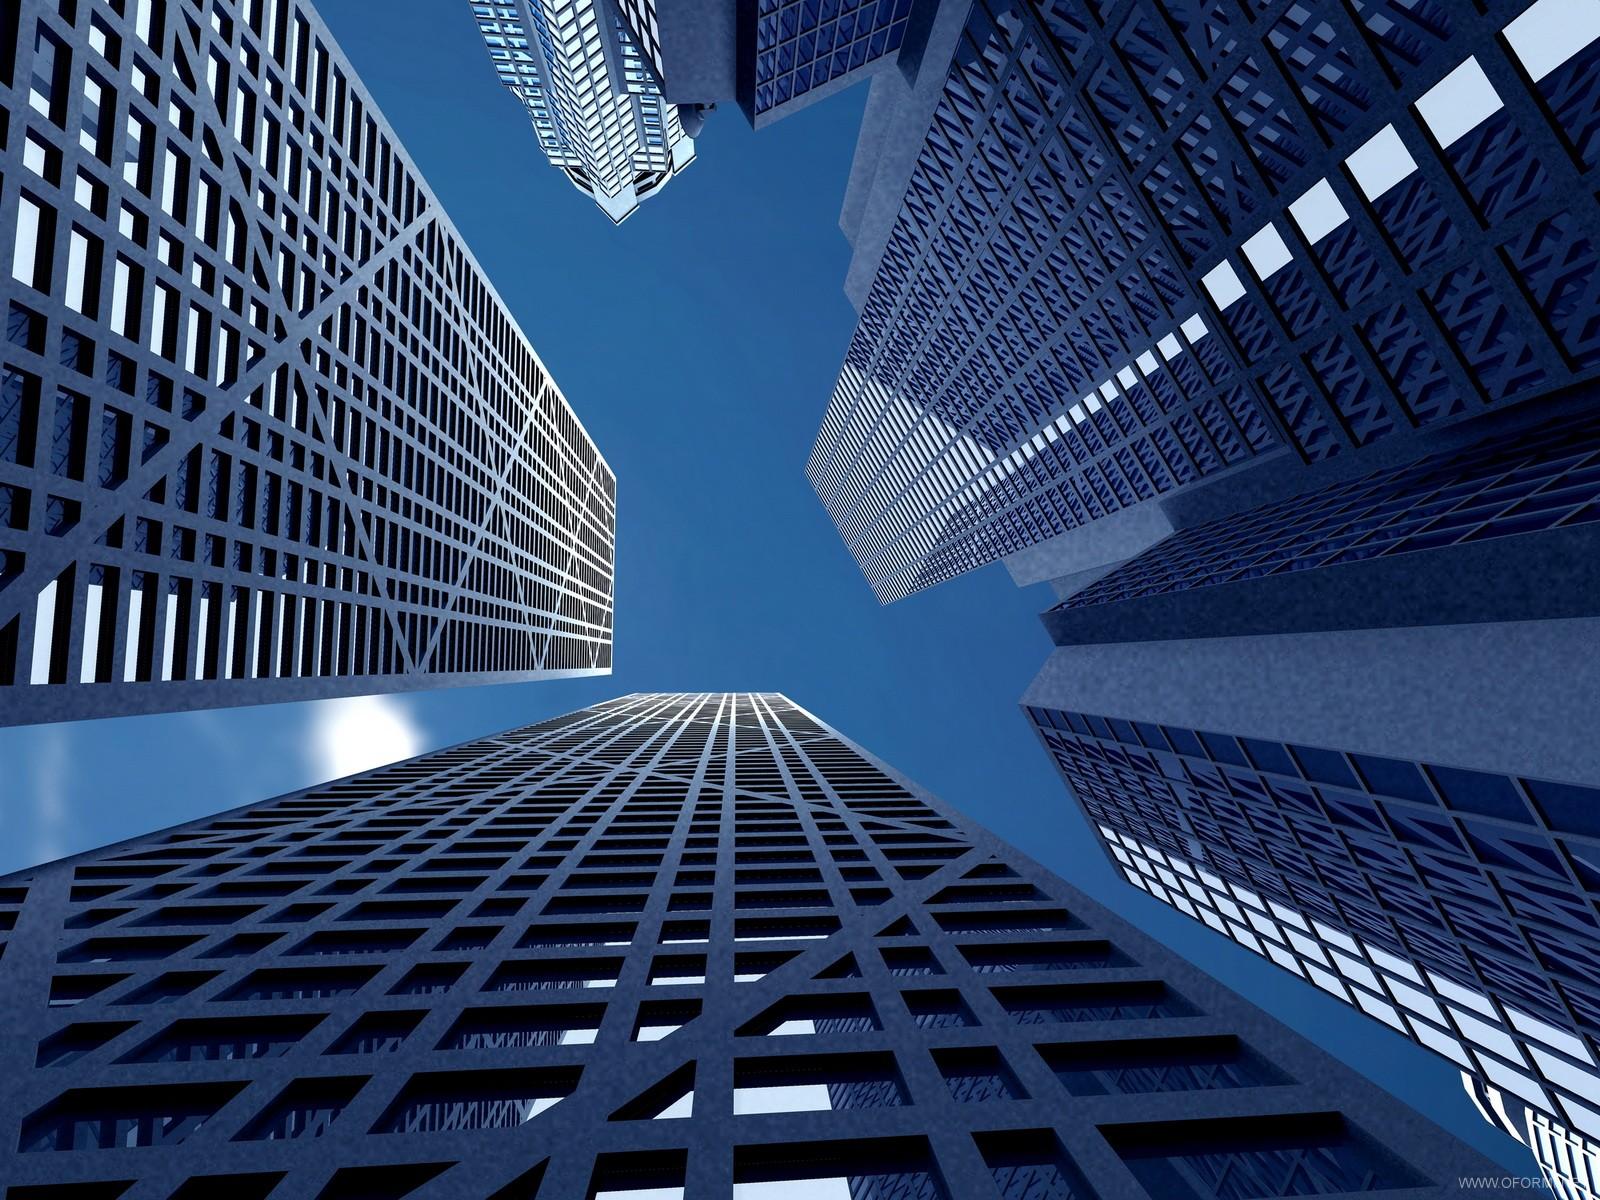 Архитектура архитектура архитектура